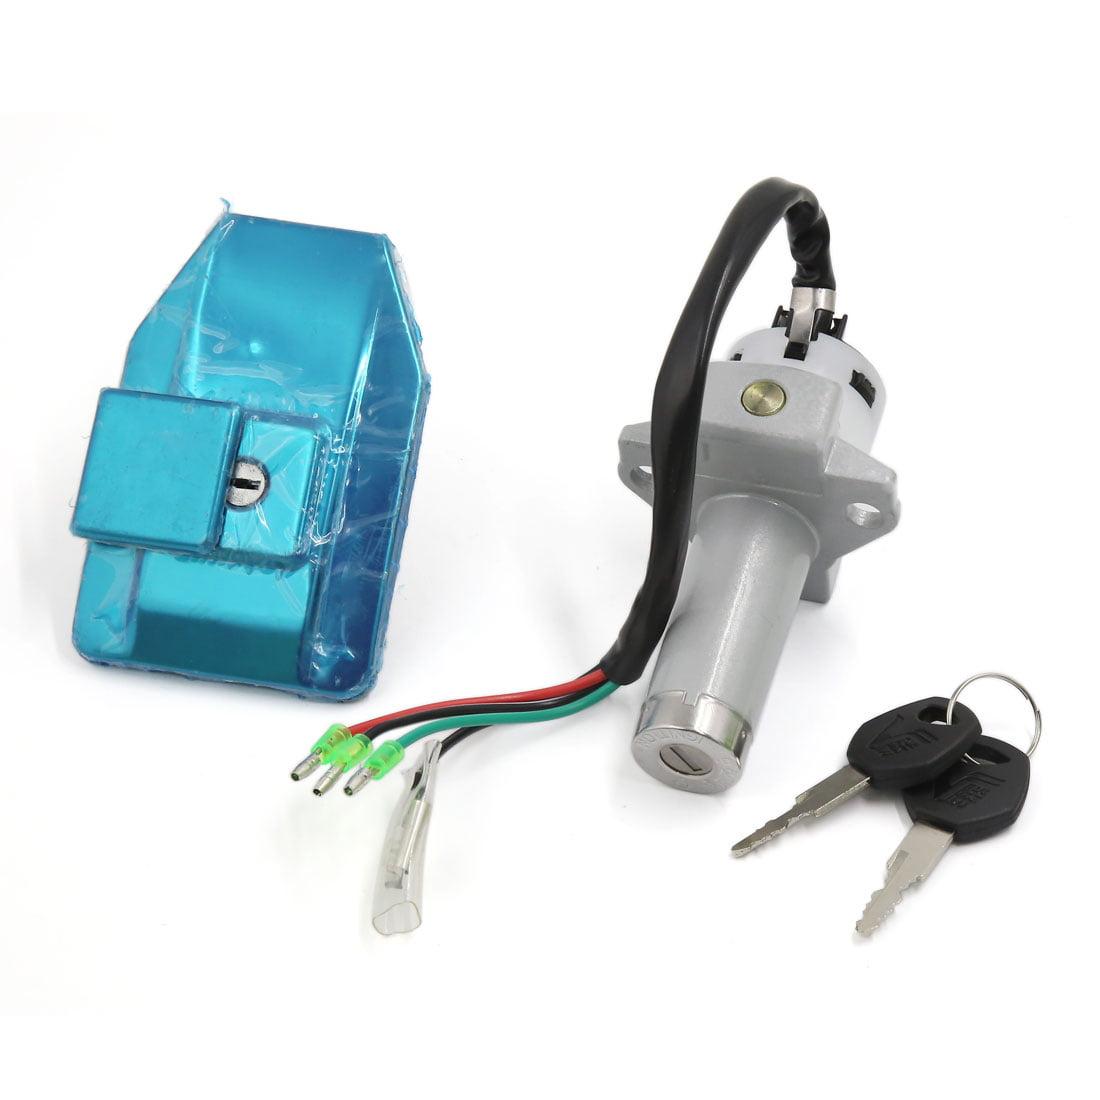 Unique Bargains Motorcycle 4 Wires Electric Door Lock Fuel Tank Cap Cover Keys Set for WY-125